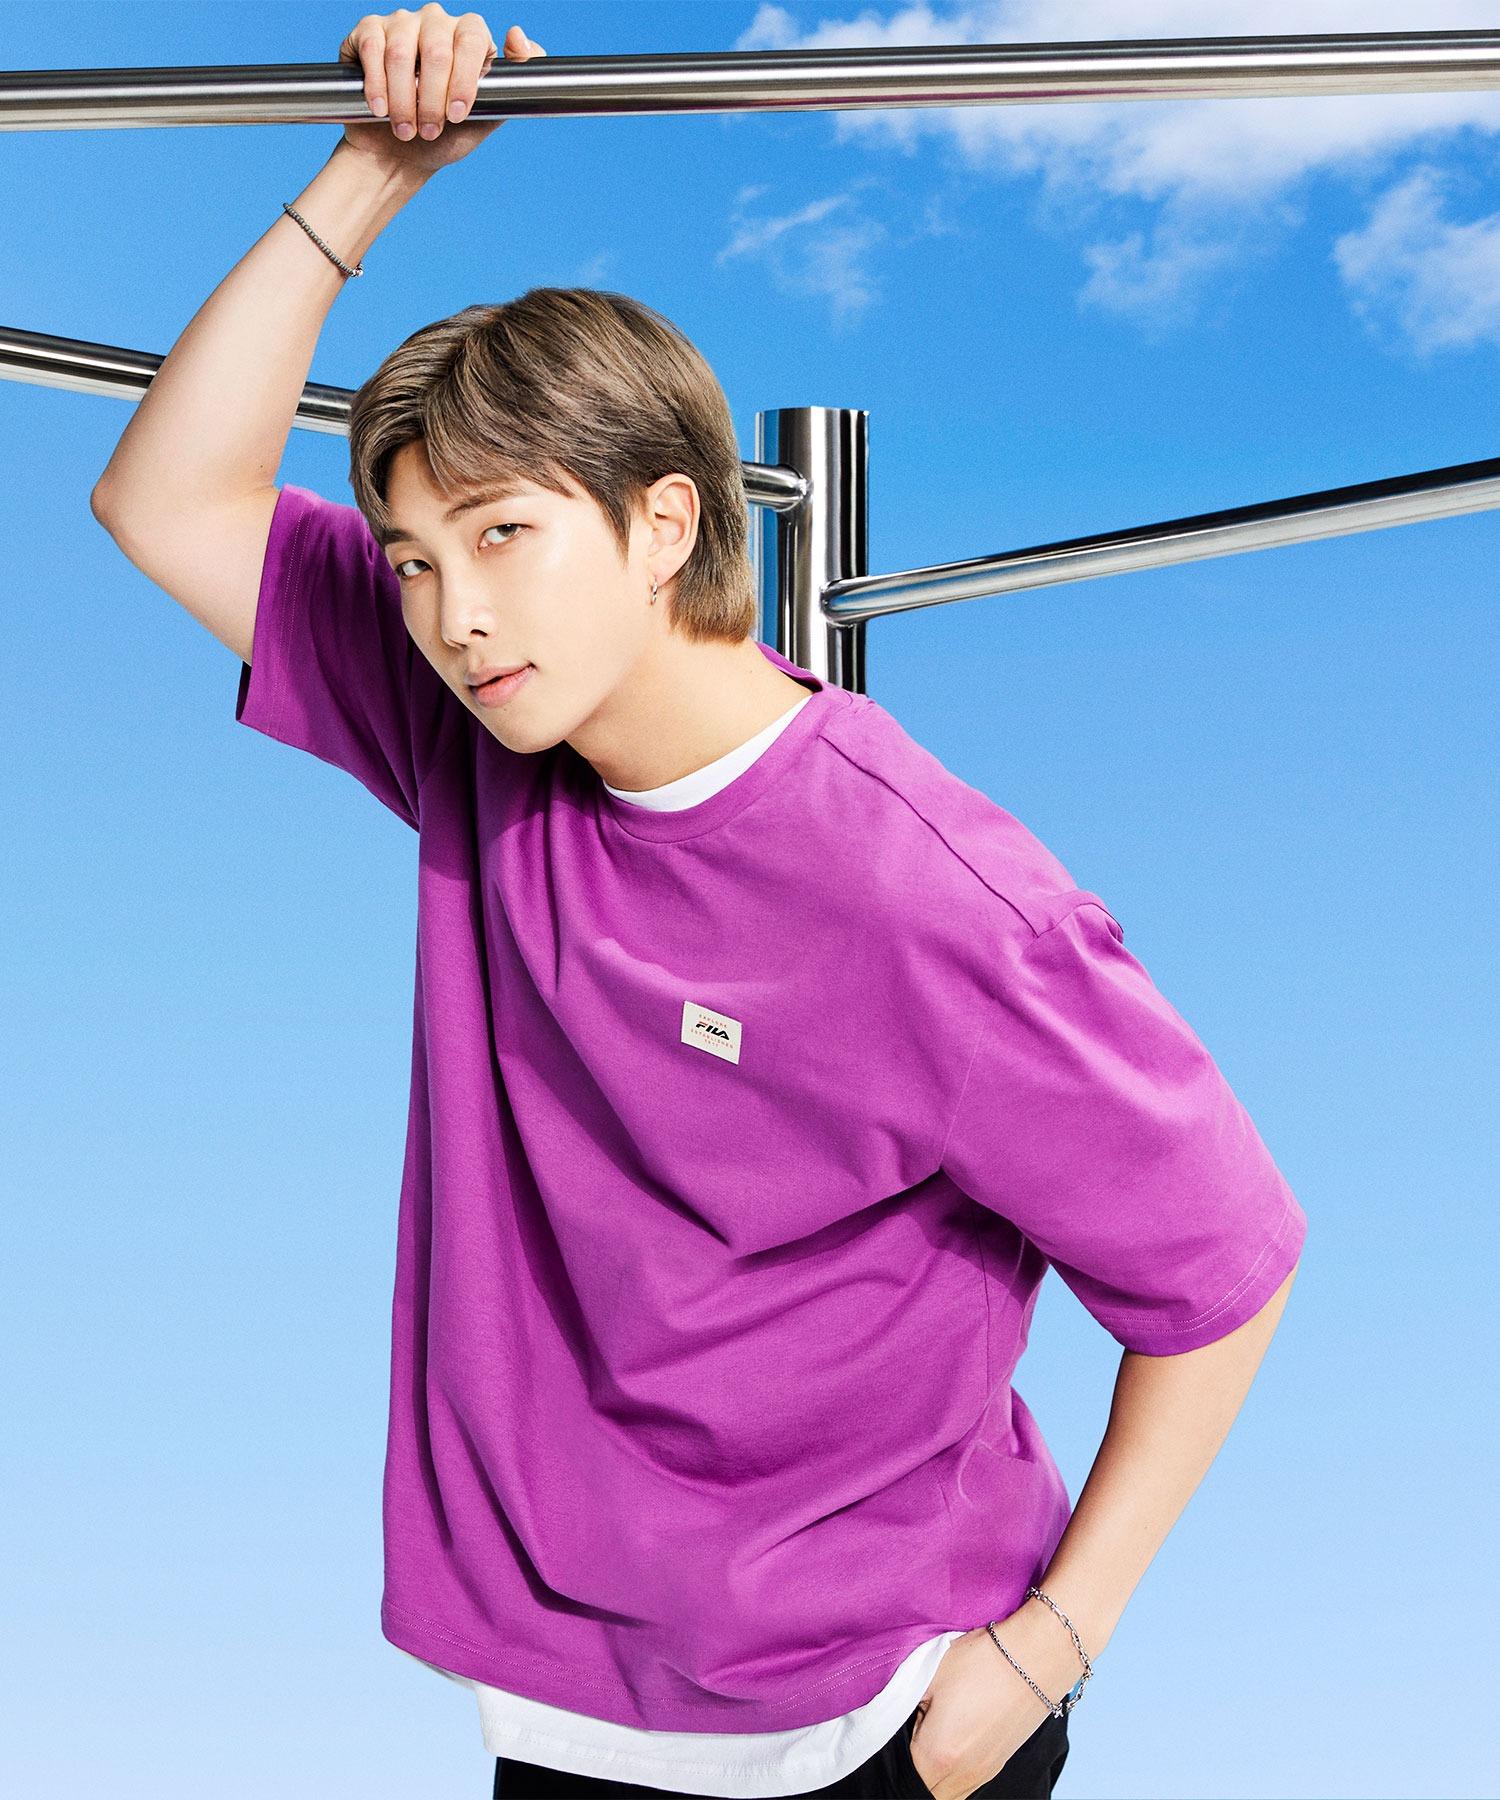 【 FILA / フィラ  】 2021SS コレクション  BTS 着用モデル Tシャツ  防弾少年団 FS0136 DWB